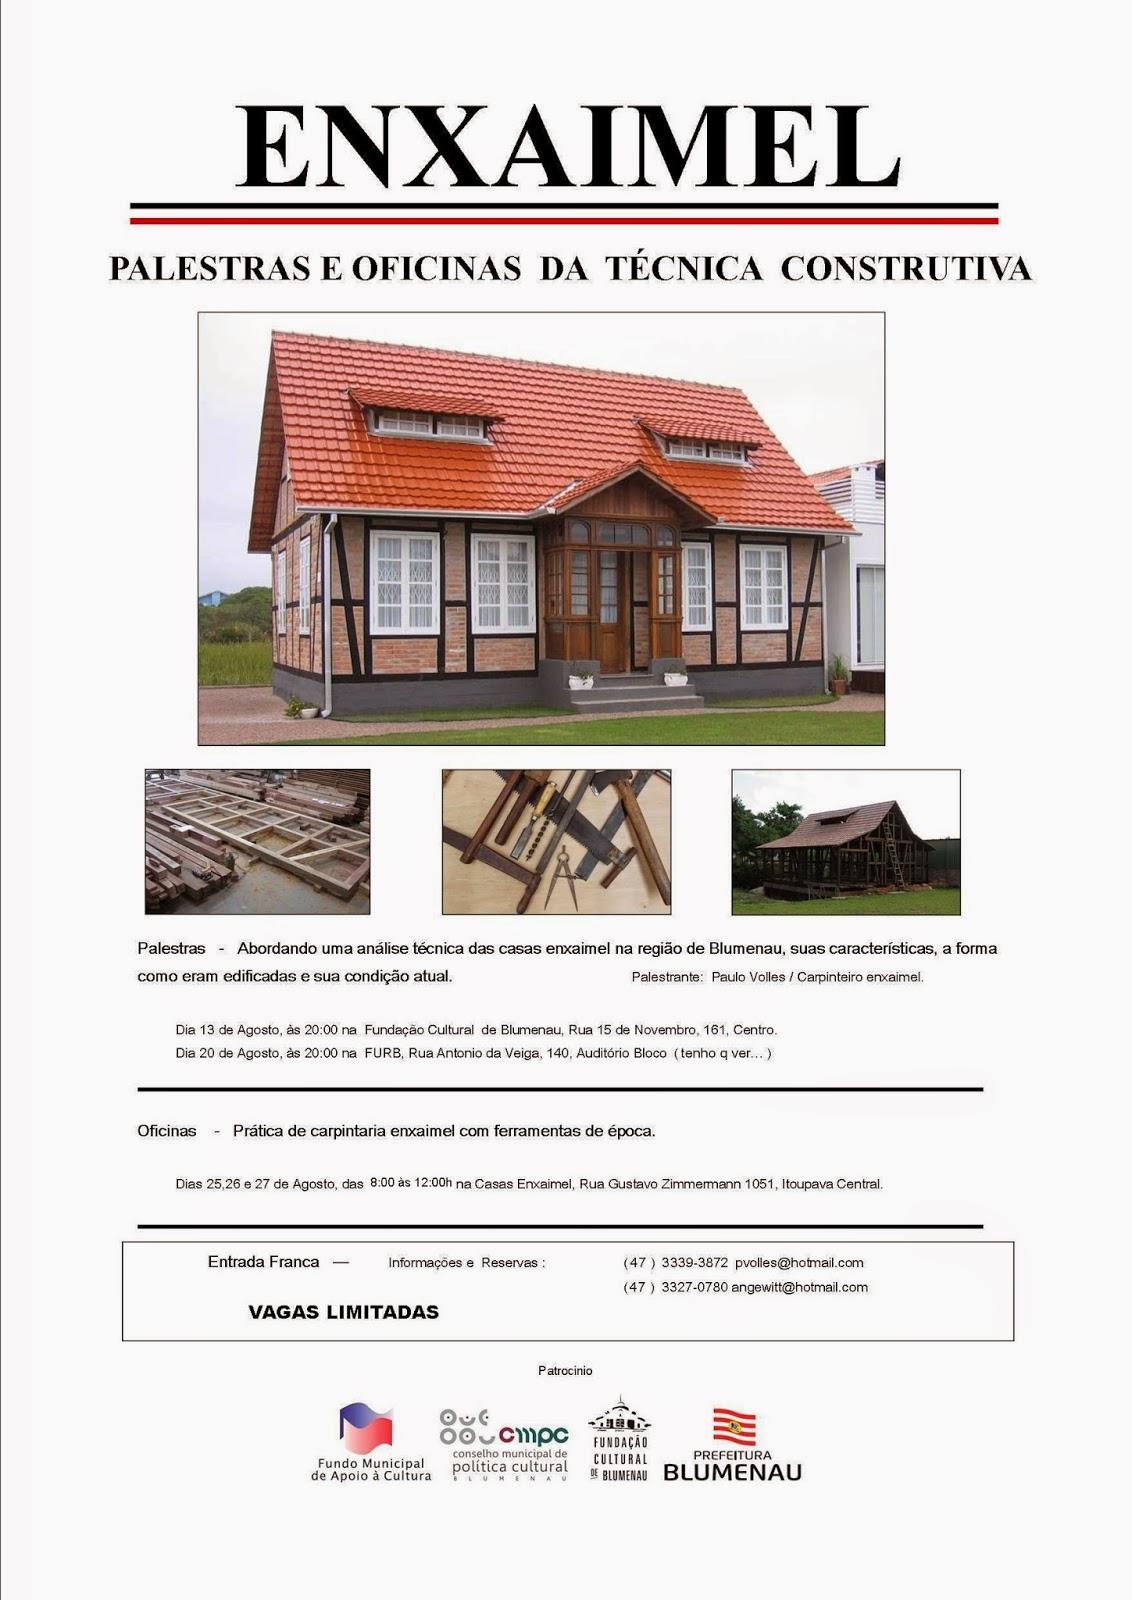 cartaz-Palestras-Tecnica-Construtiva_Enxaimel